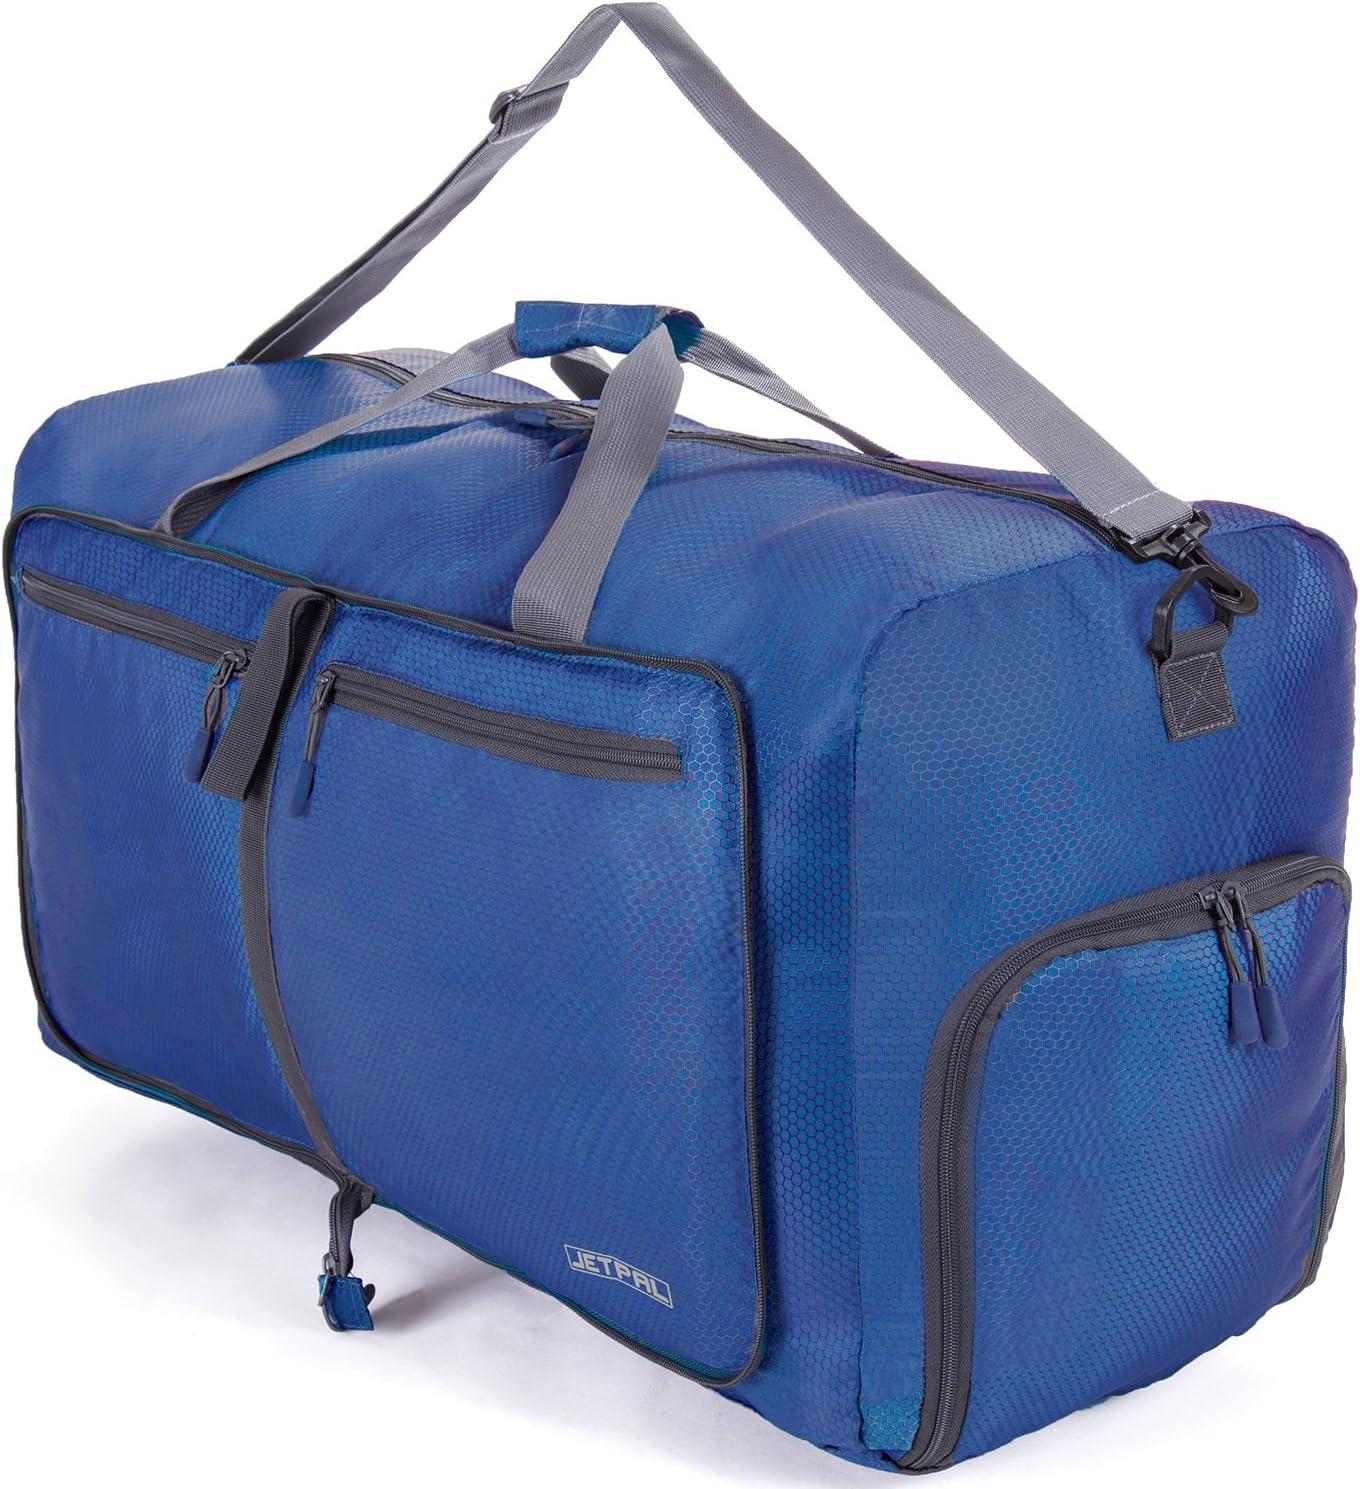 Choose Your Size JETPAL Spacious Foldable Duffel Bag